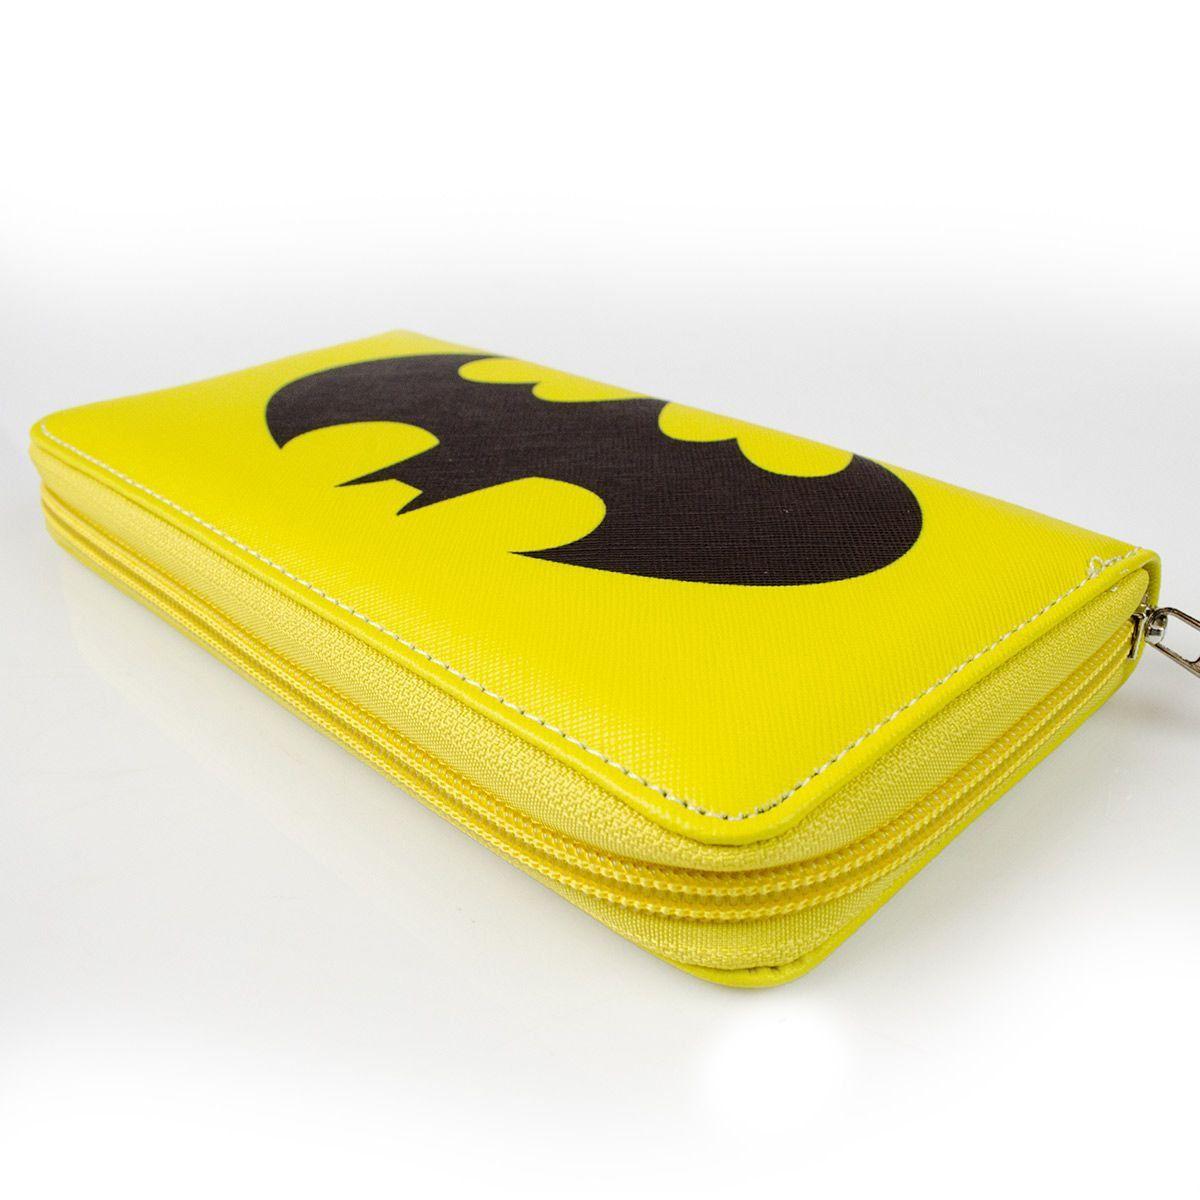 Carteira Feminina com Ziper Batman Logo Oficial  - bandUP Store Marketplace